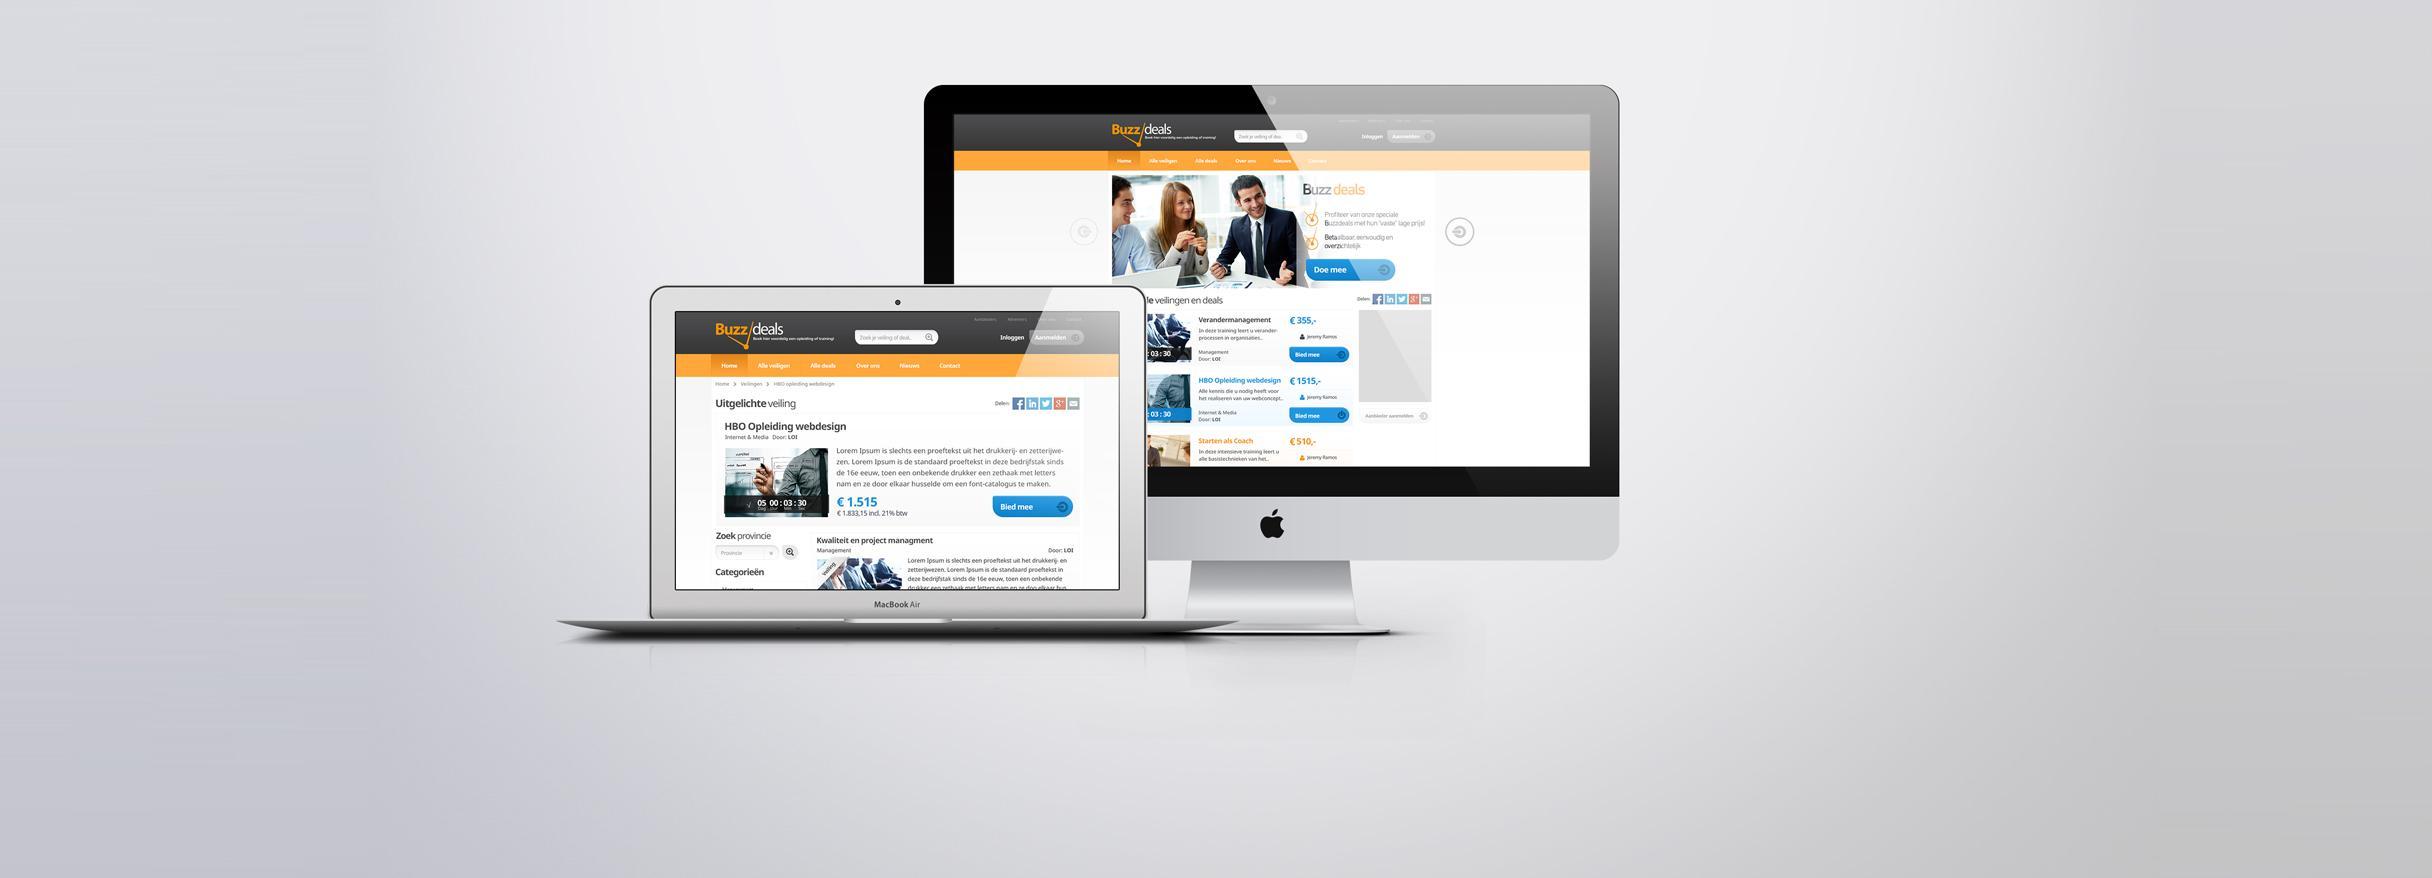 Veilingwebsite